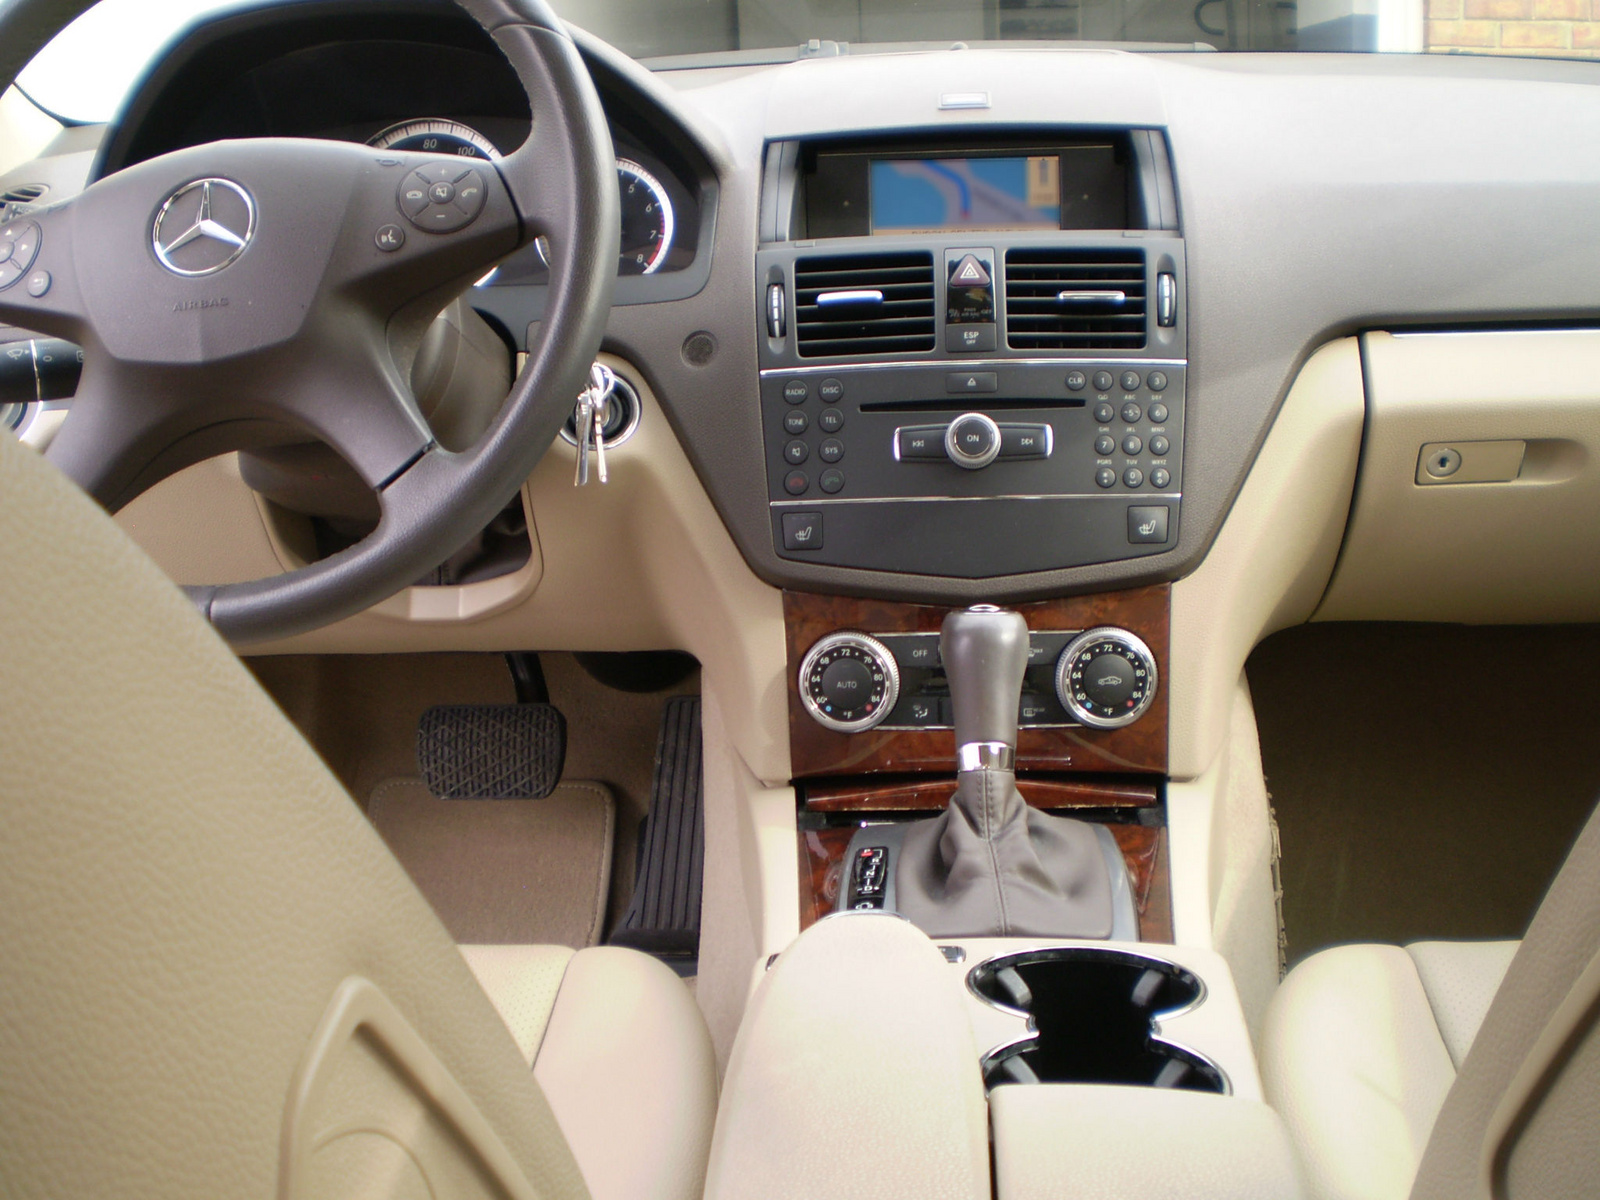 2009 mercedes benz c class interior pictures cargurus for Mercedes benz c300 interior